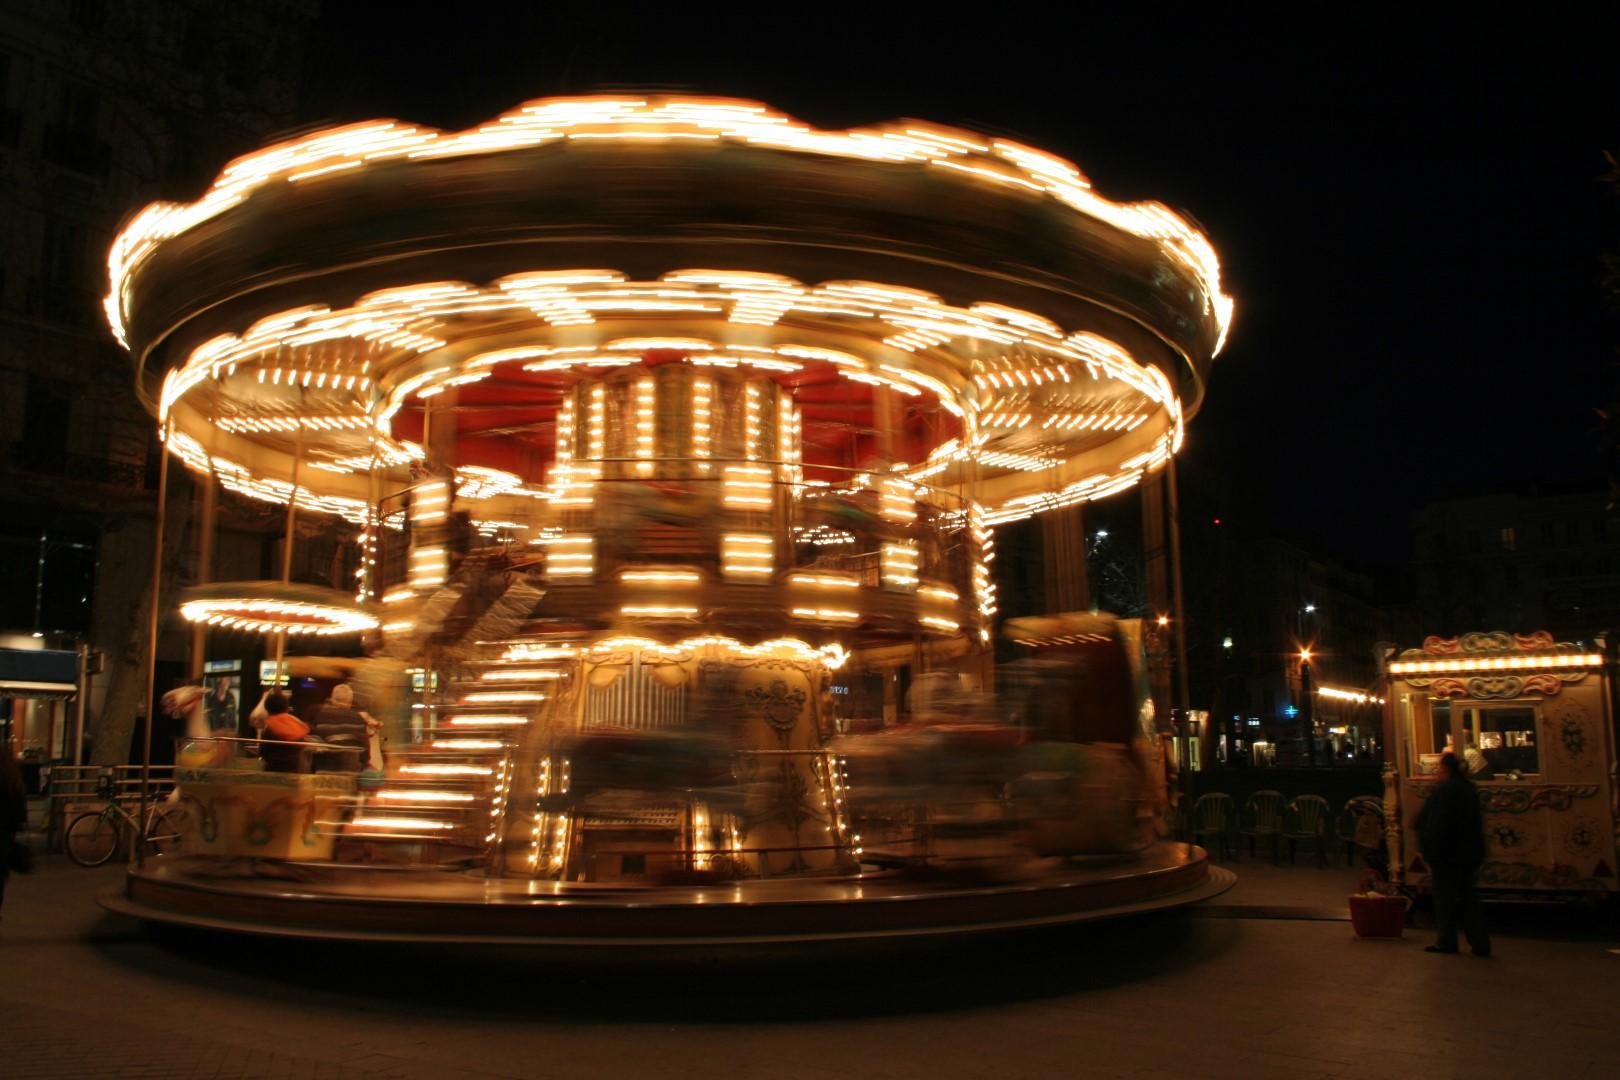 Latest on the legislative staffing merry-go-round